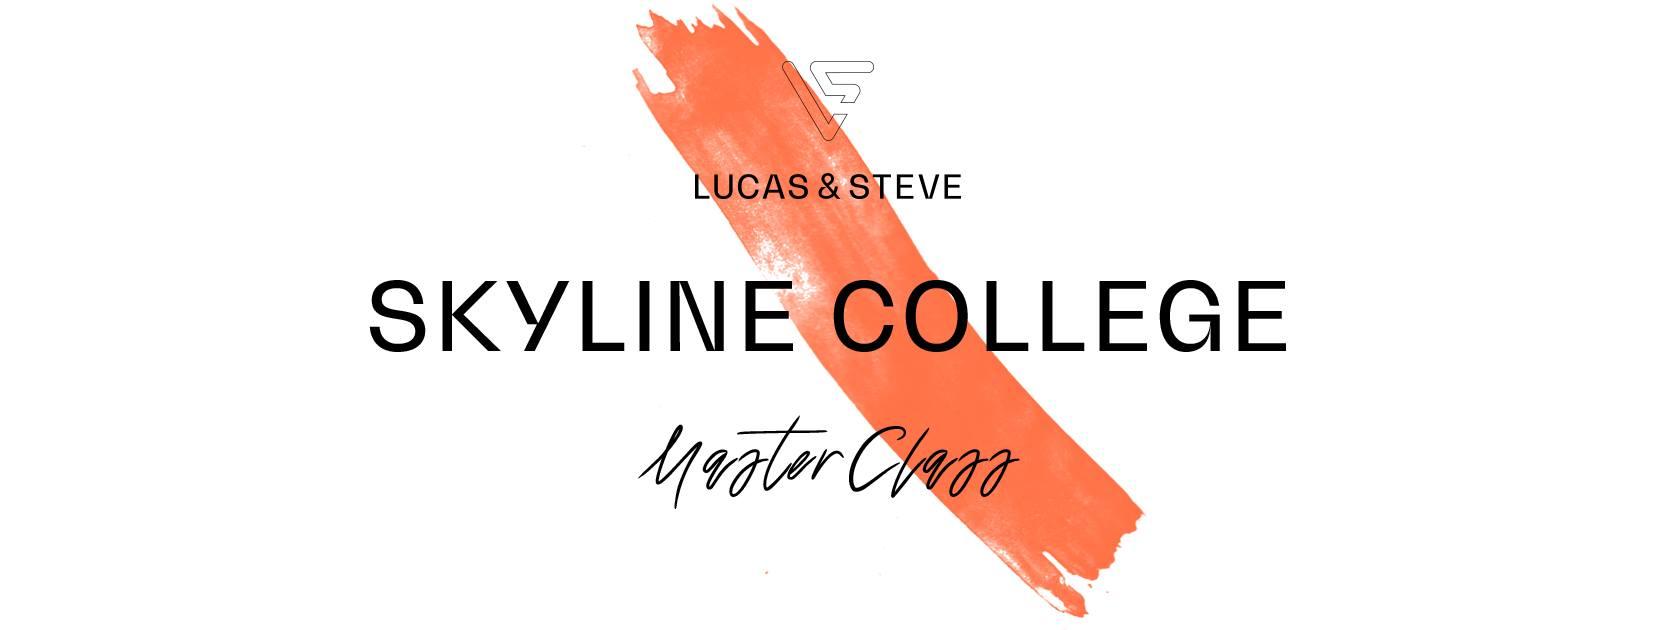 Lucas & Steve Skyline College